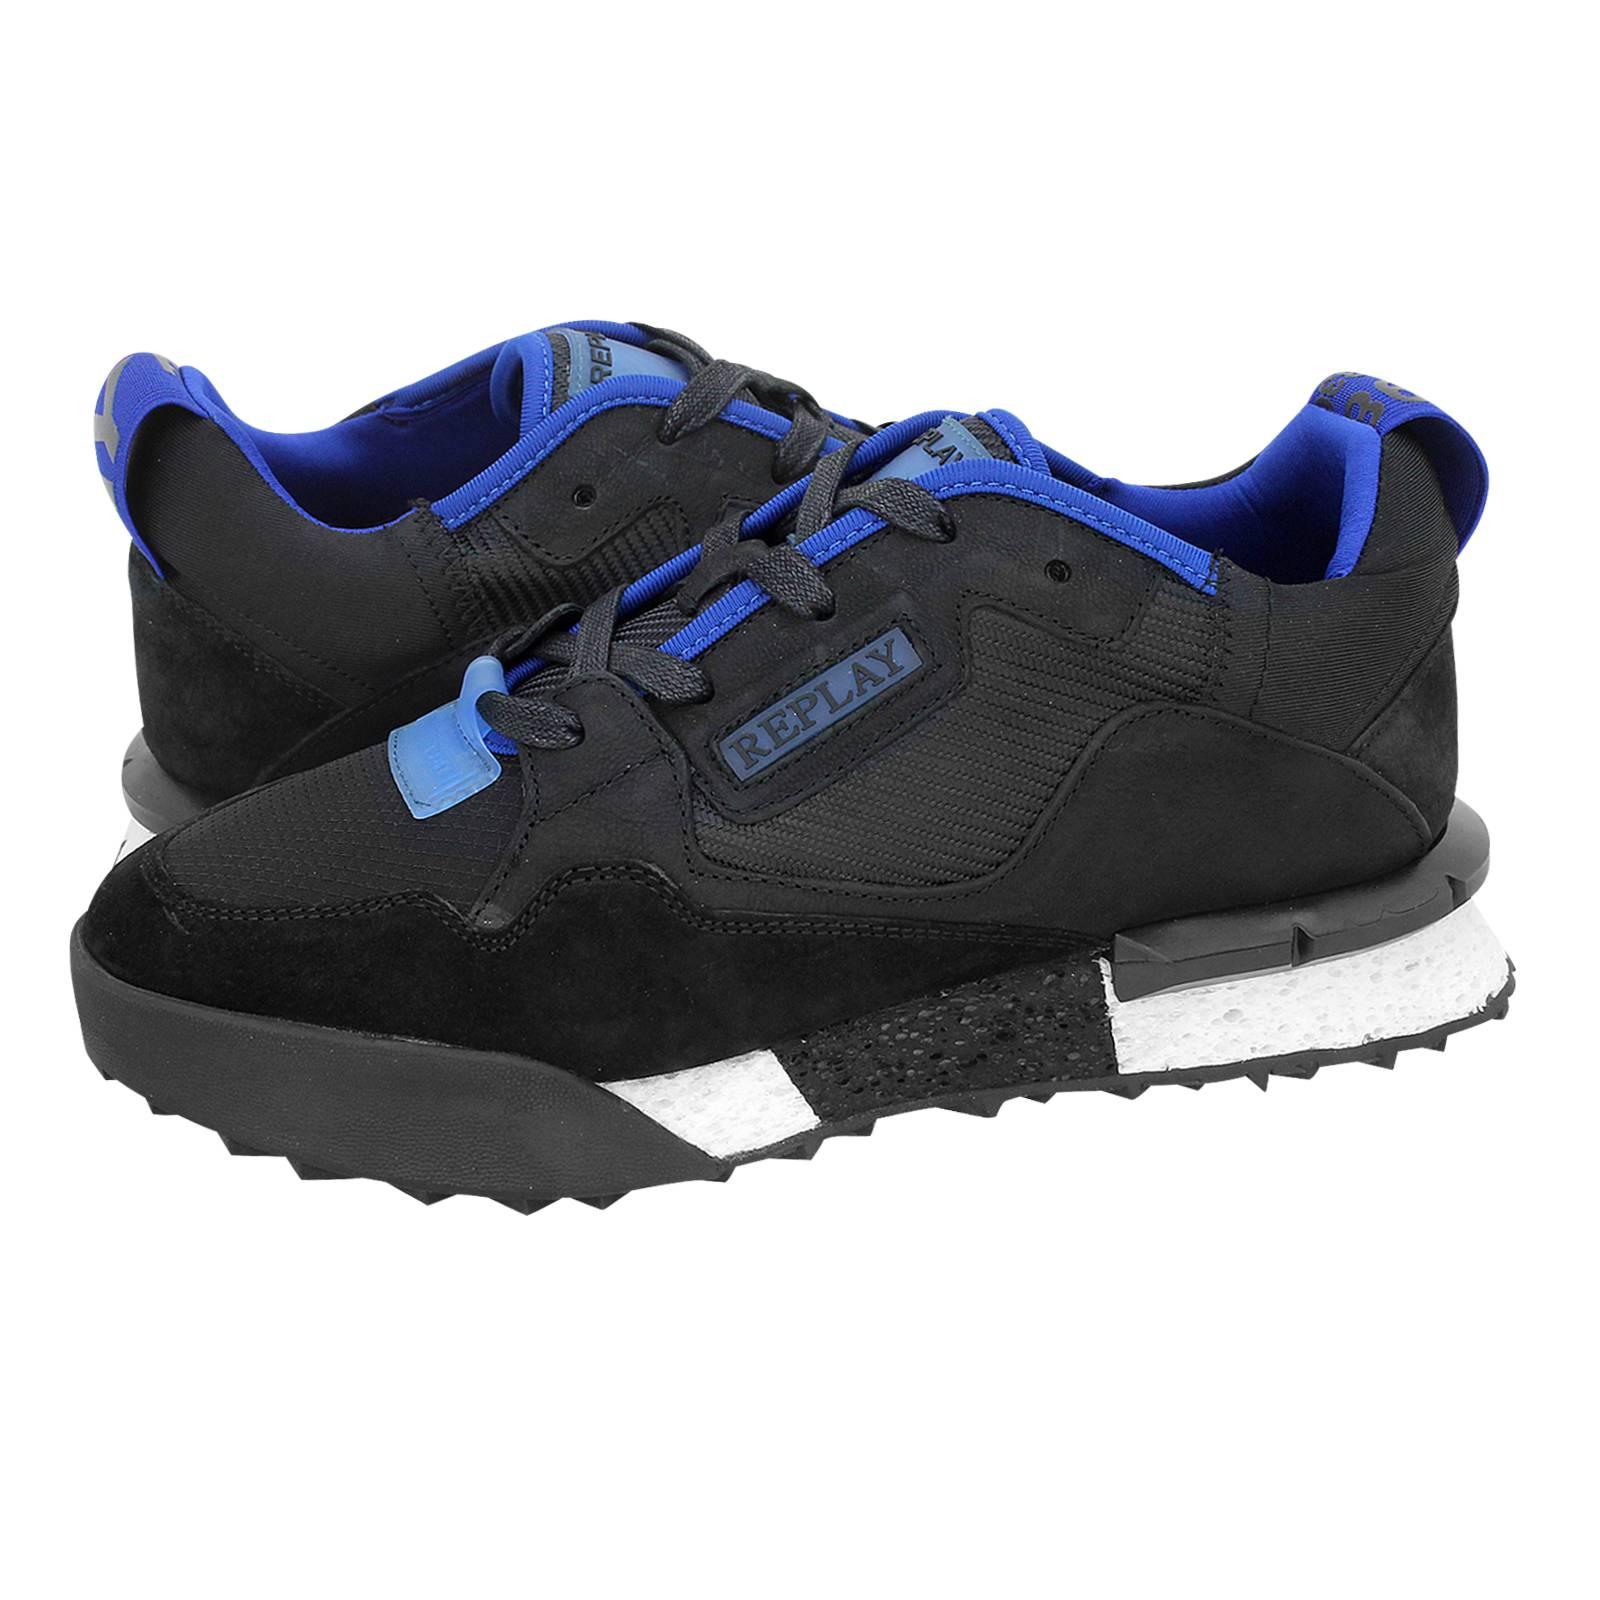 Moyard - Replay Men's casual shoes made